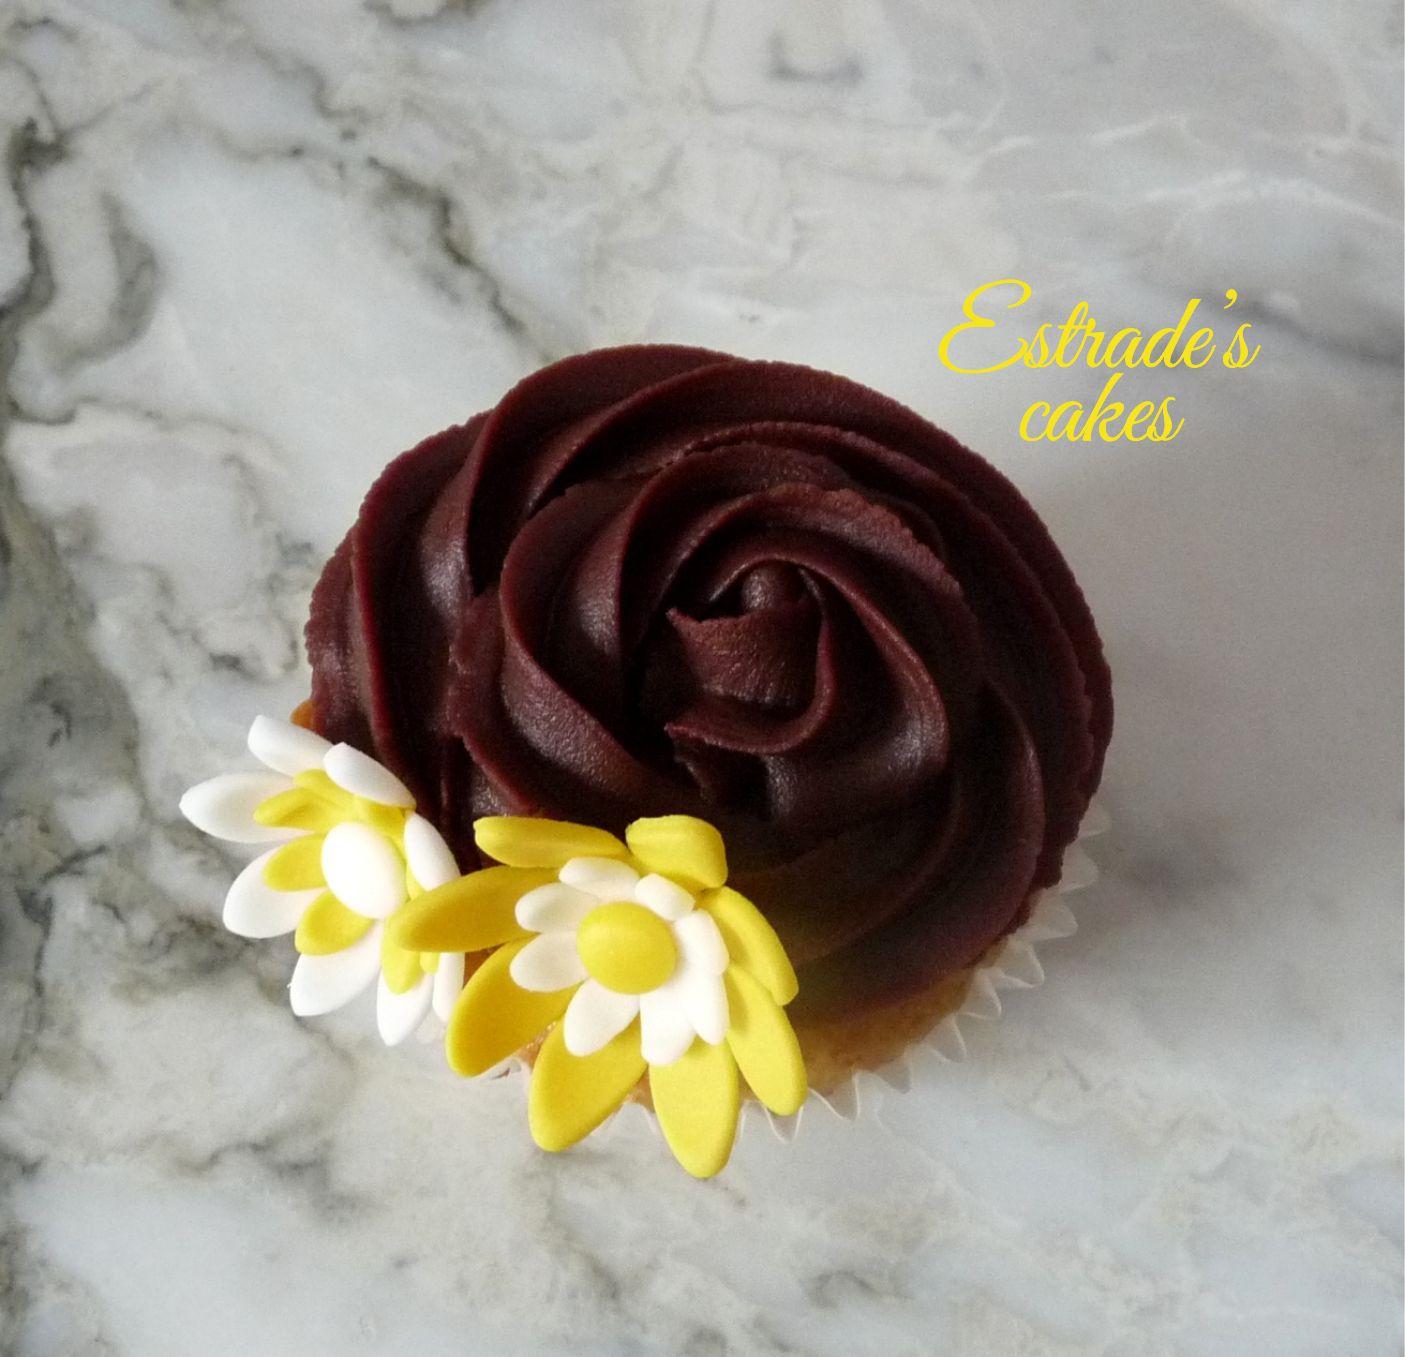 cupcakes de almendra con ganache de chocolate decorado con flores - 3